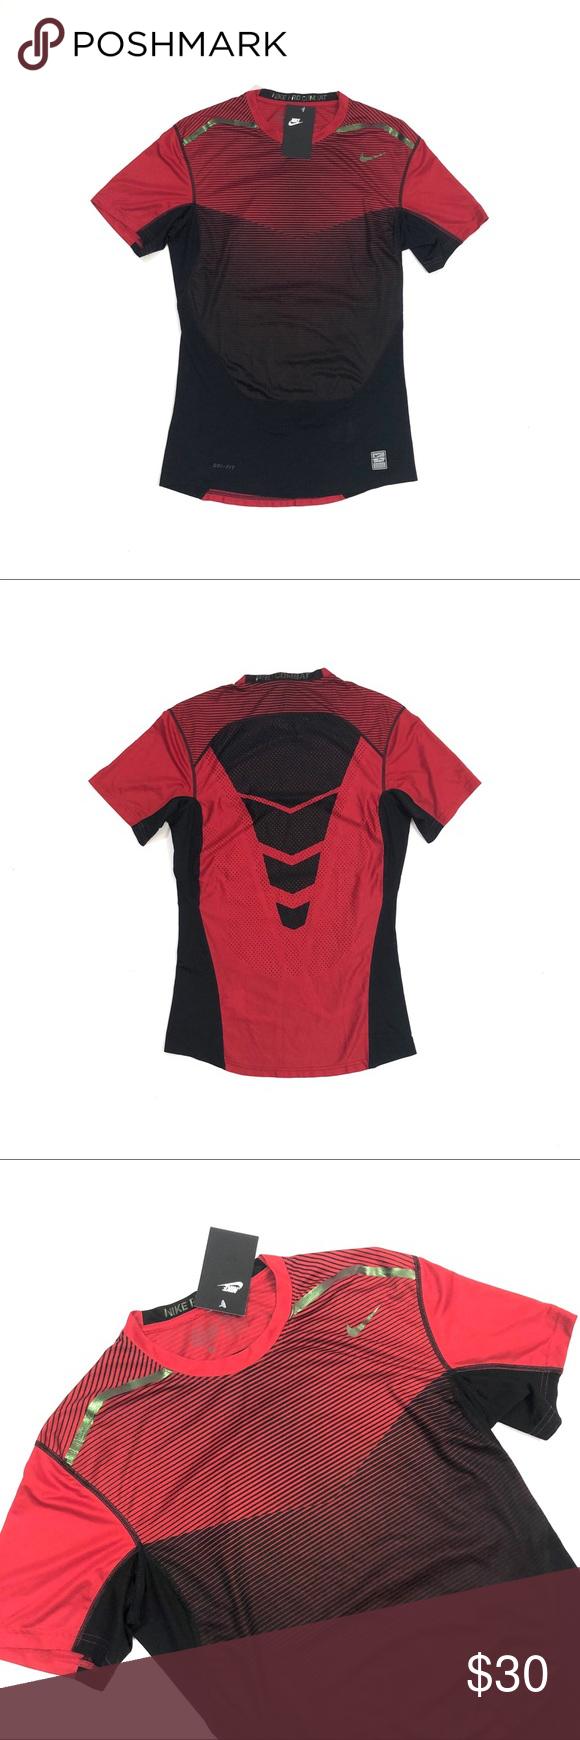 Men S Nike Pro Combat Short Sleeve Shirt Nike Pro Combat Shorts Combat Shorts Nike Pro Combat [ 1740 x 580 Pixel ]